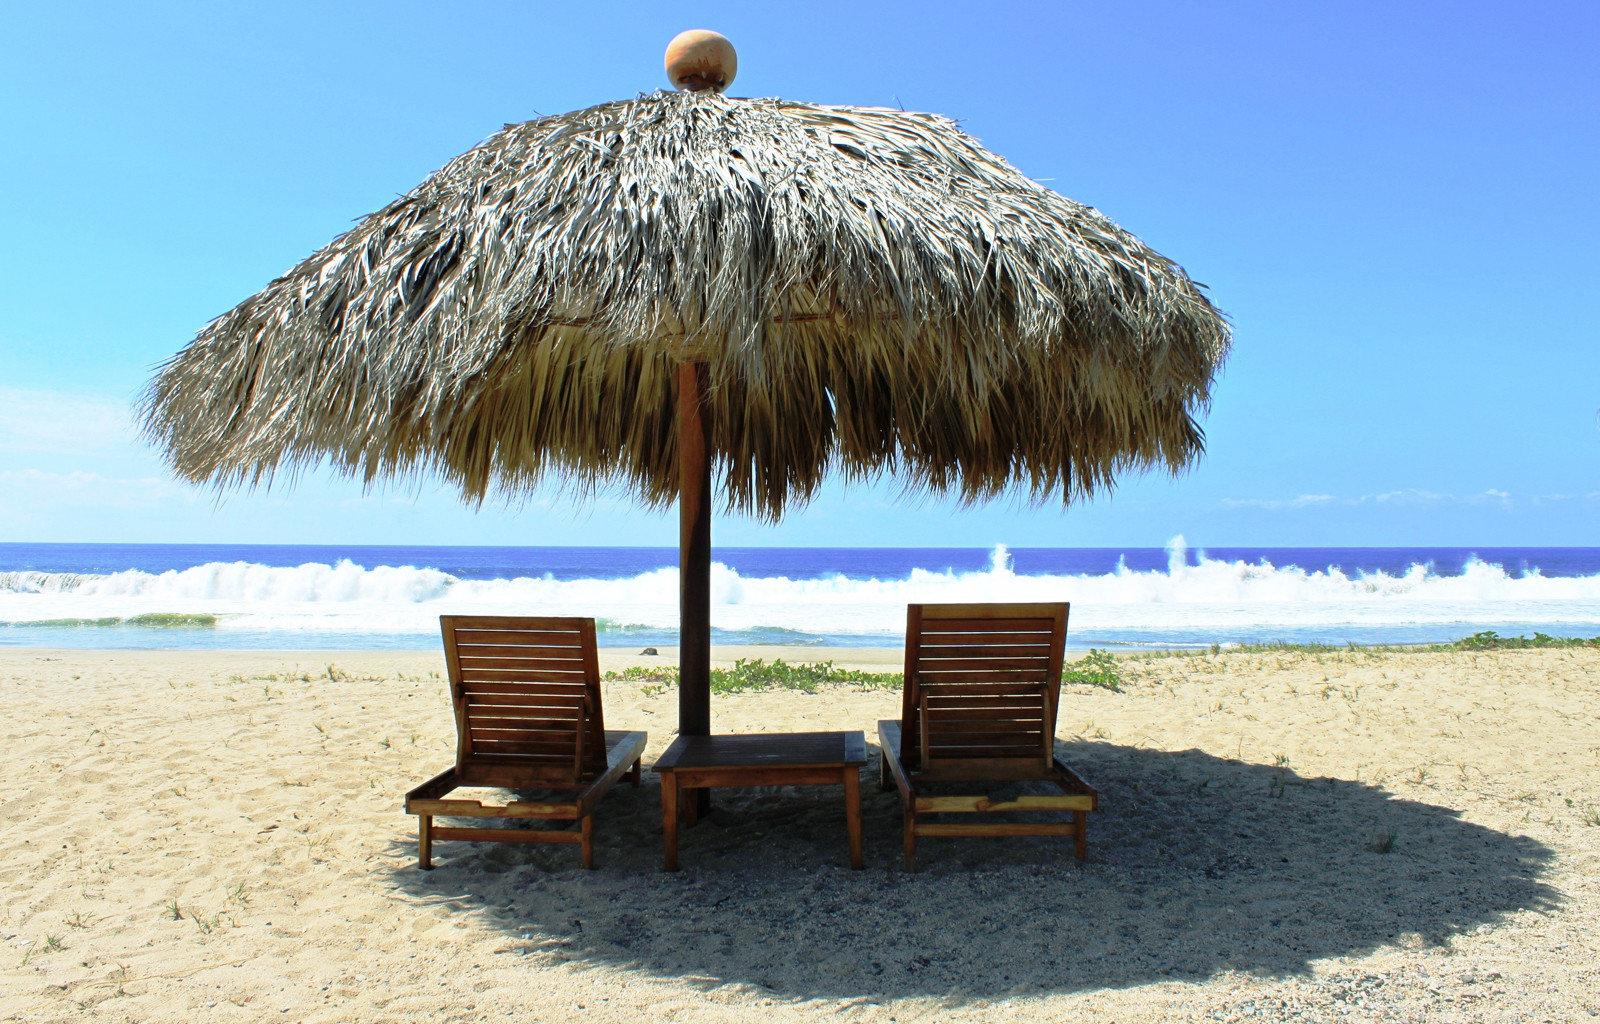 Beach Beachfront Honeymoon Romance Romantic Scenic views sky umbrella chair Sea tree shore Ocean sand arecales hut Coast lawn Resort sandy